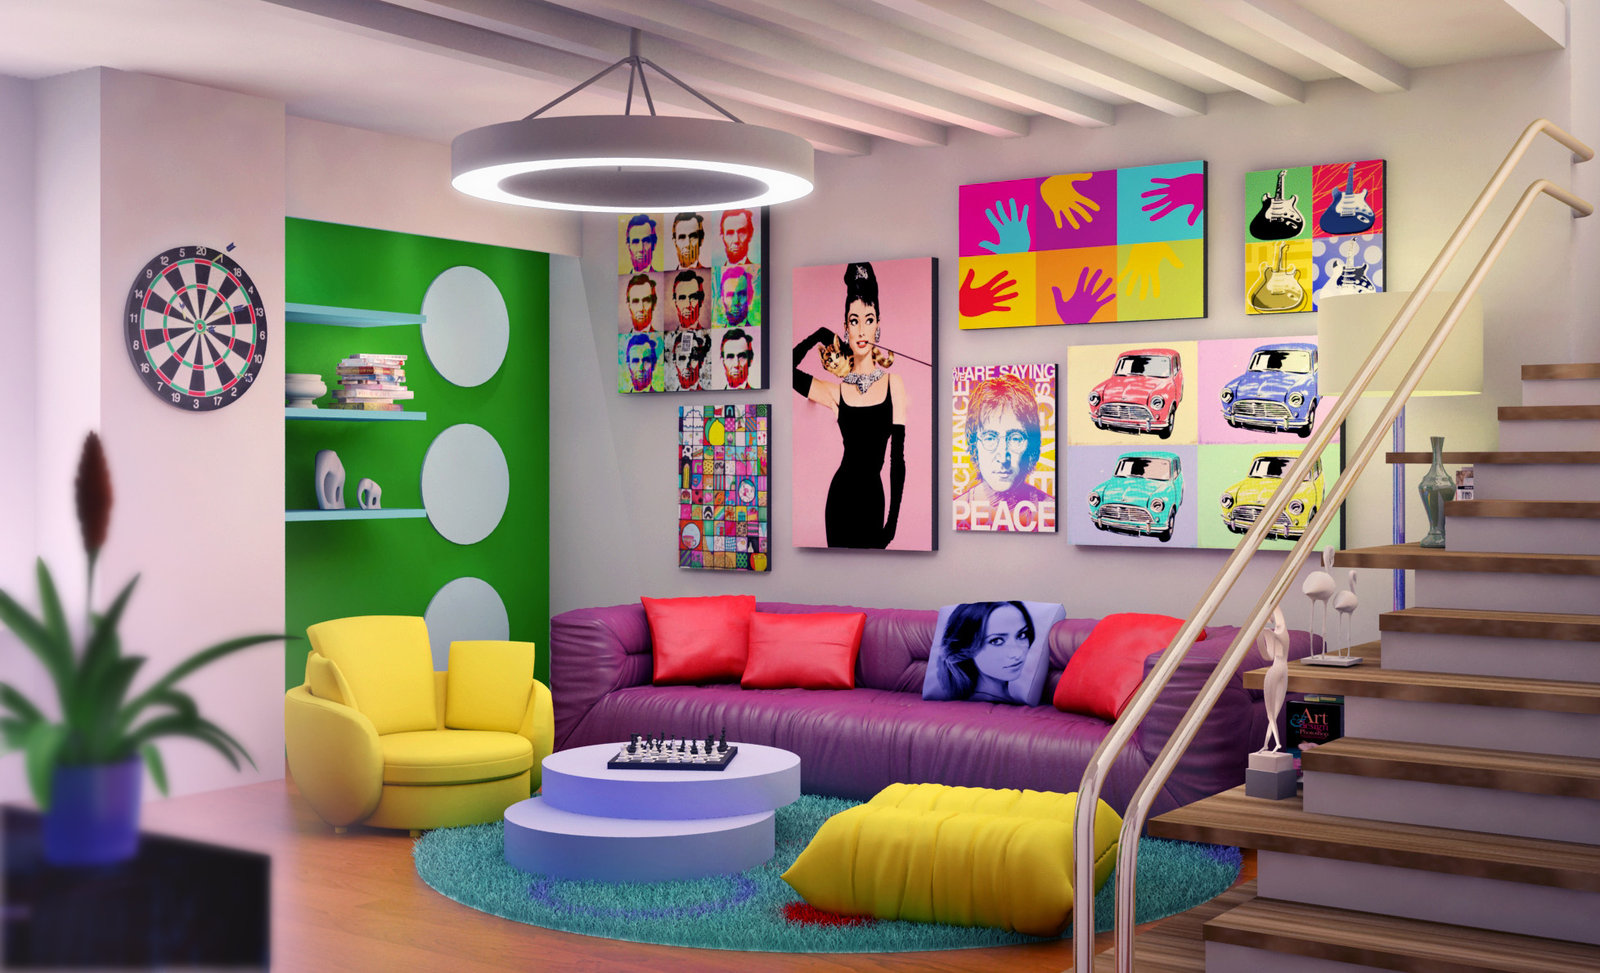 Nice wallpapers Interior Art Design  1600x973px